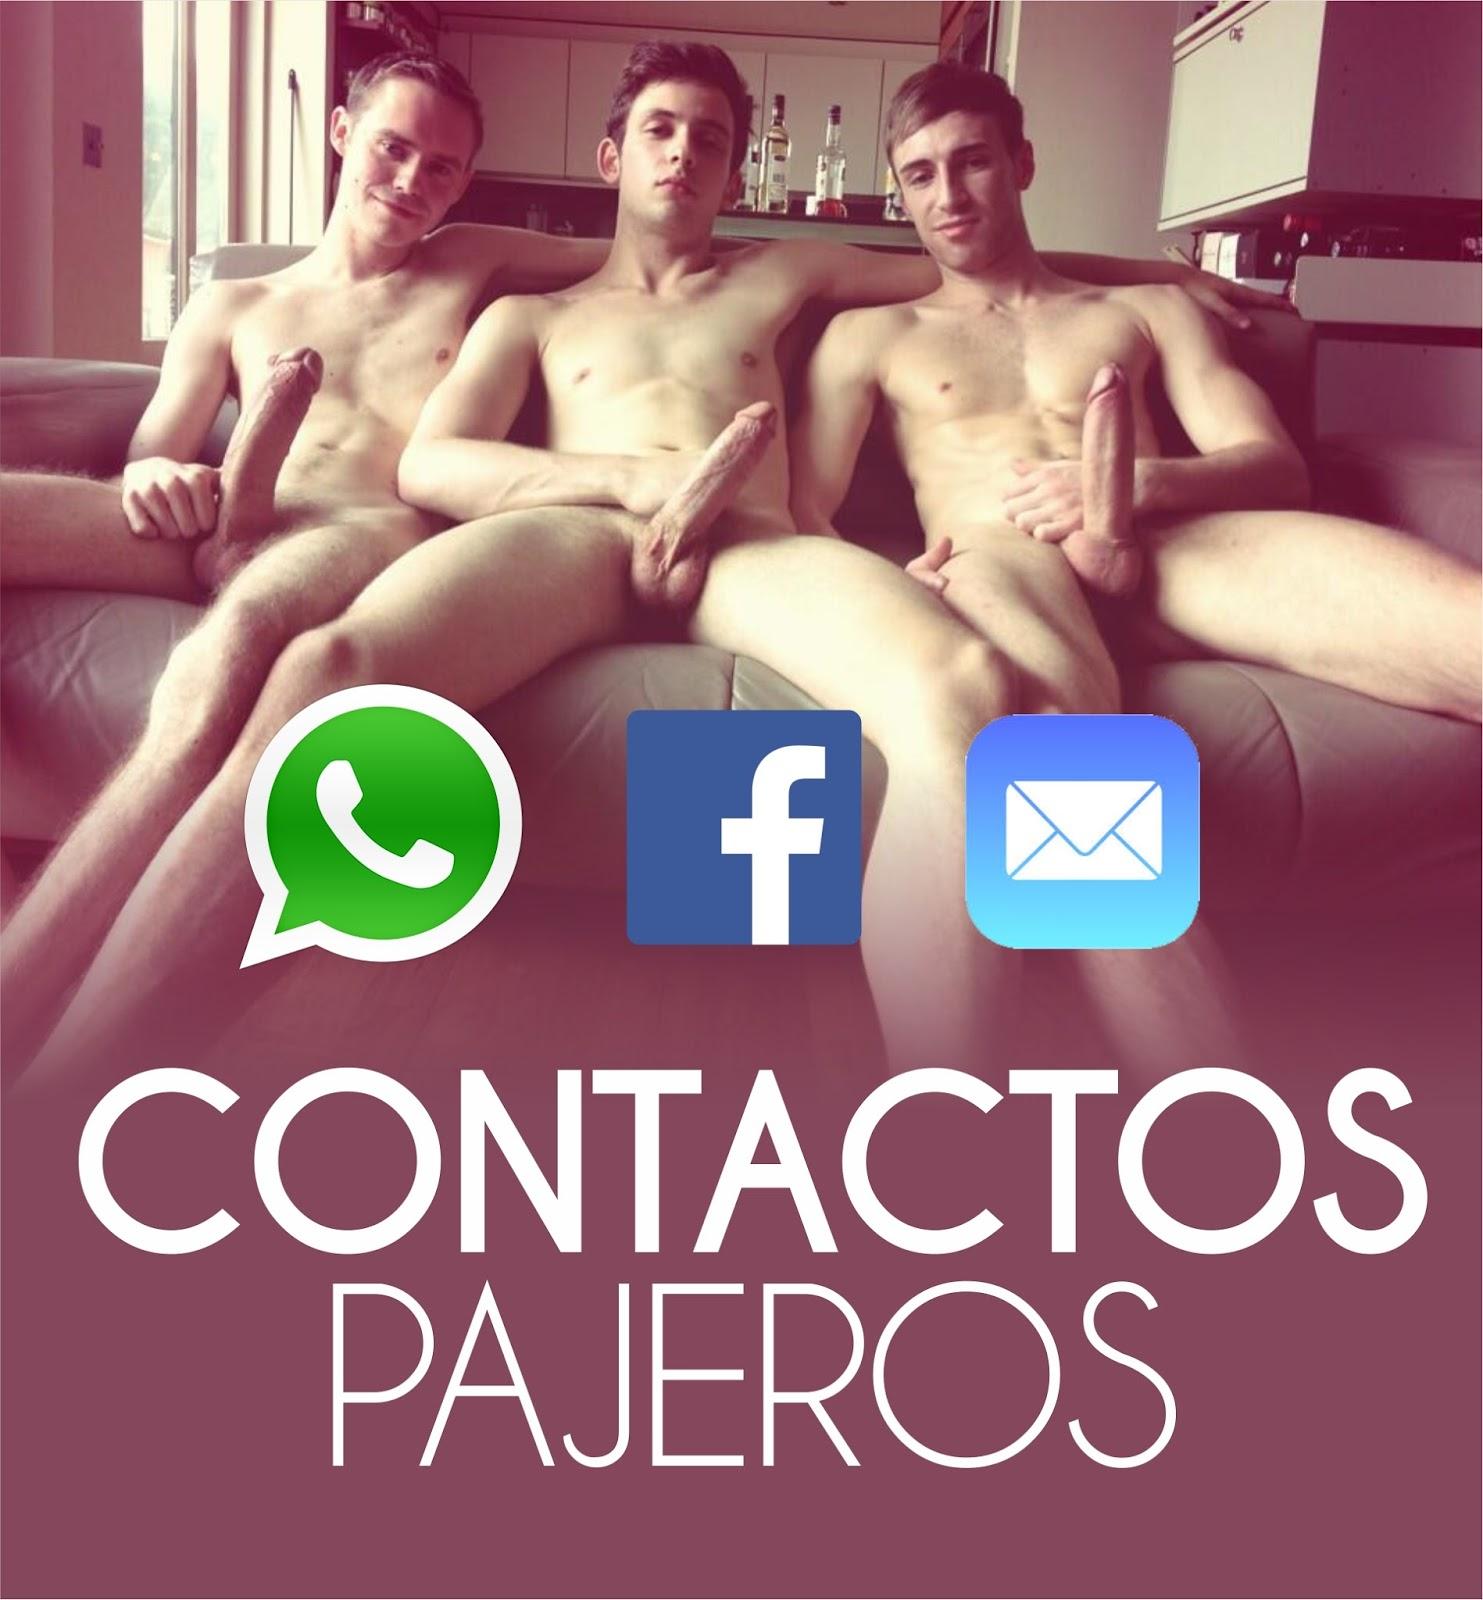 Amigos Pajas Deporte Porno pajaadictos - original